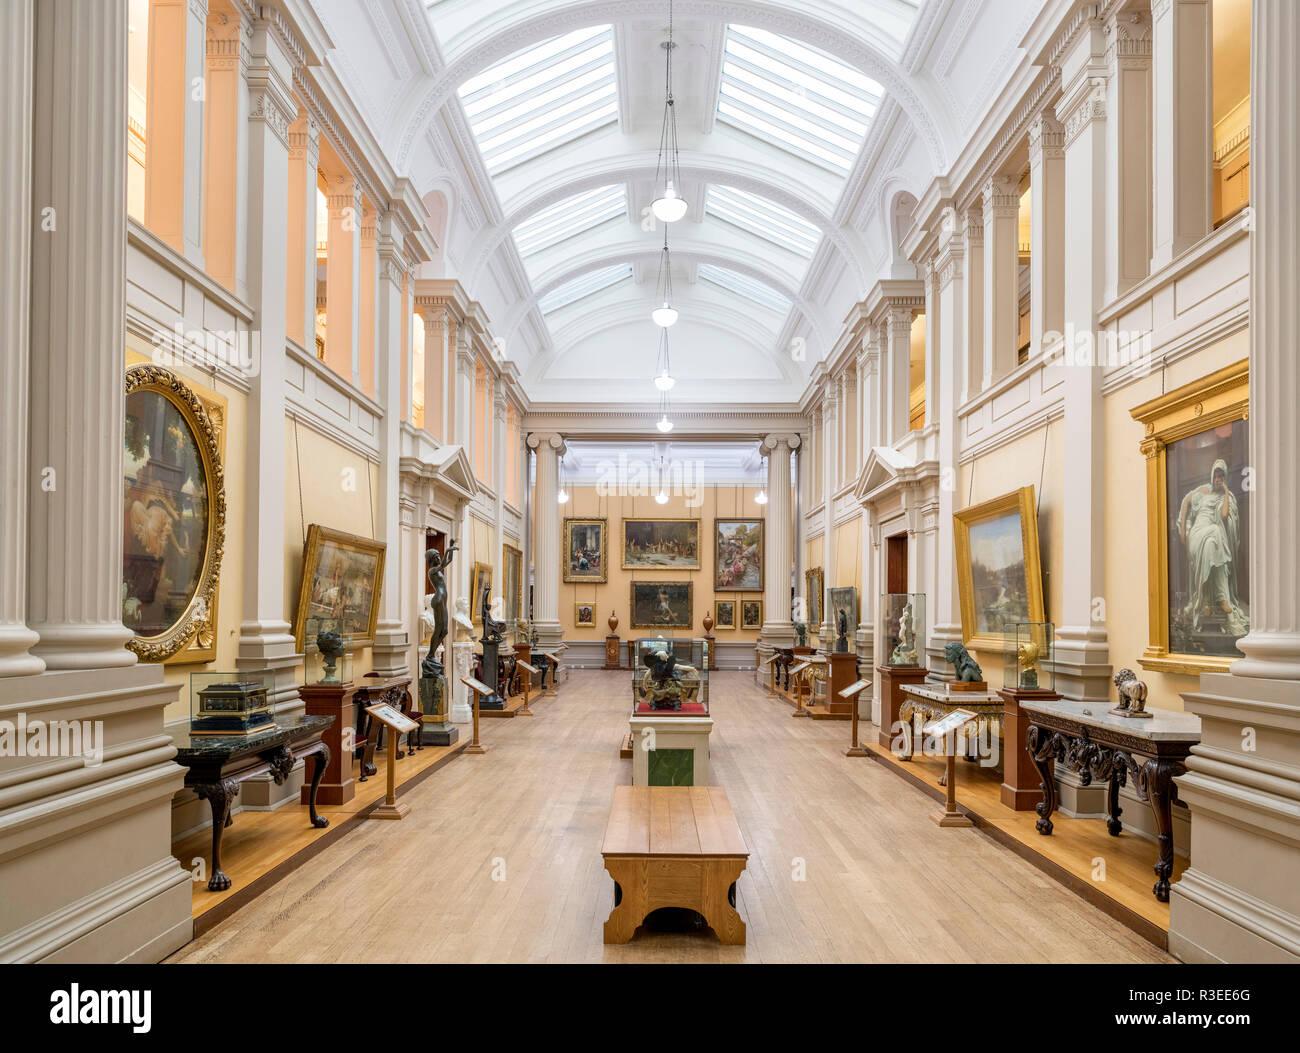 Interior of the Lady Lever Art Gallery, Port Sunlight, Liverpool, Merseyside, England, UK - Stock Image